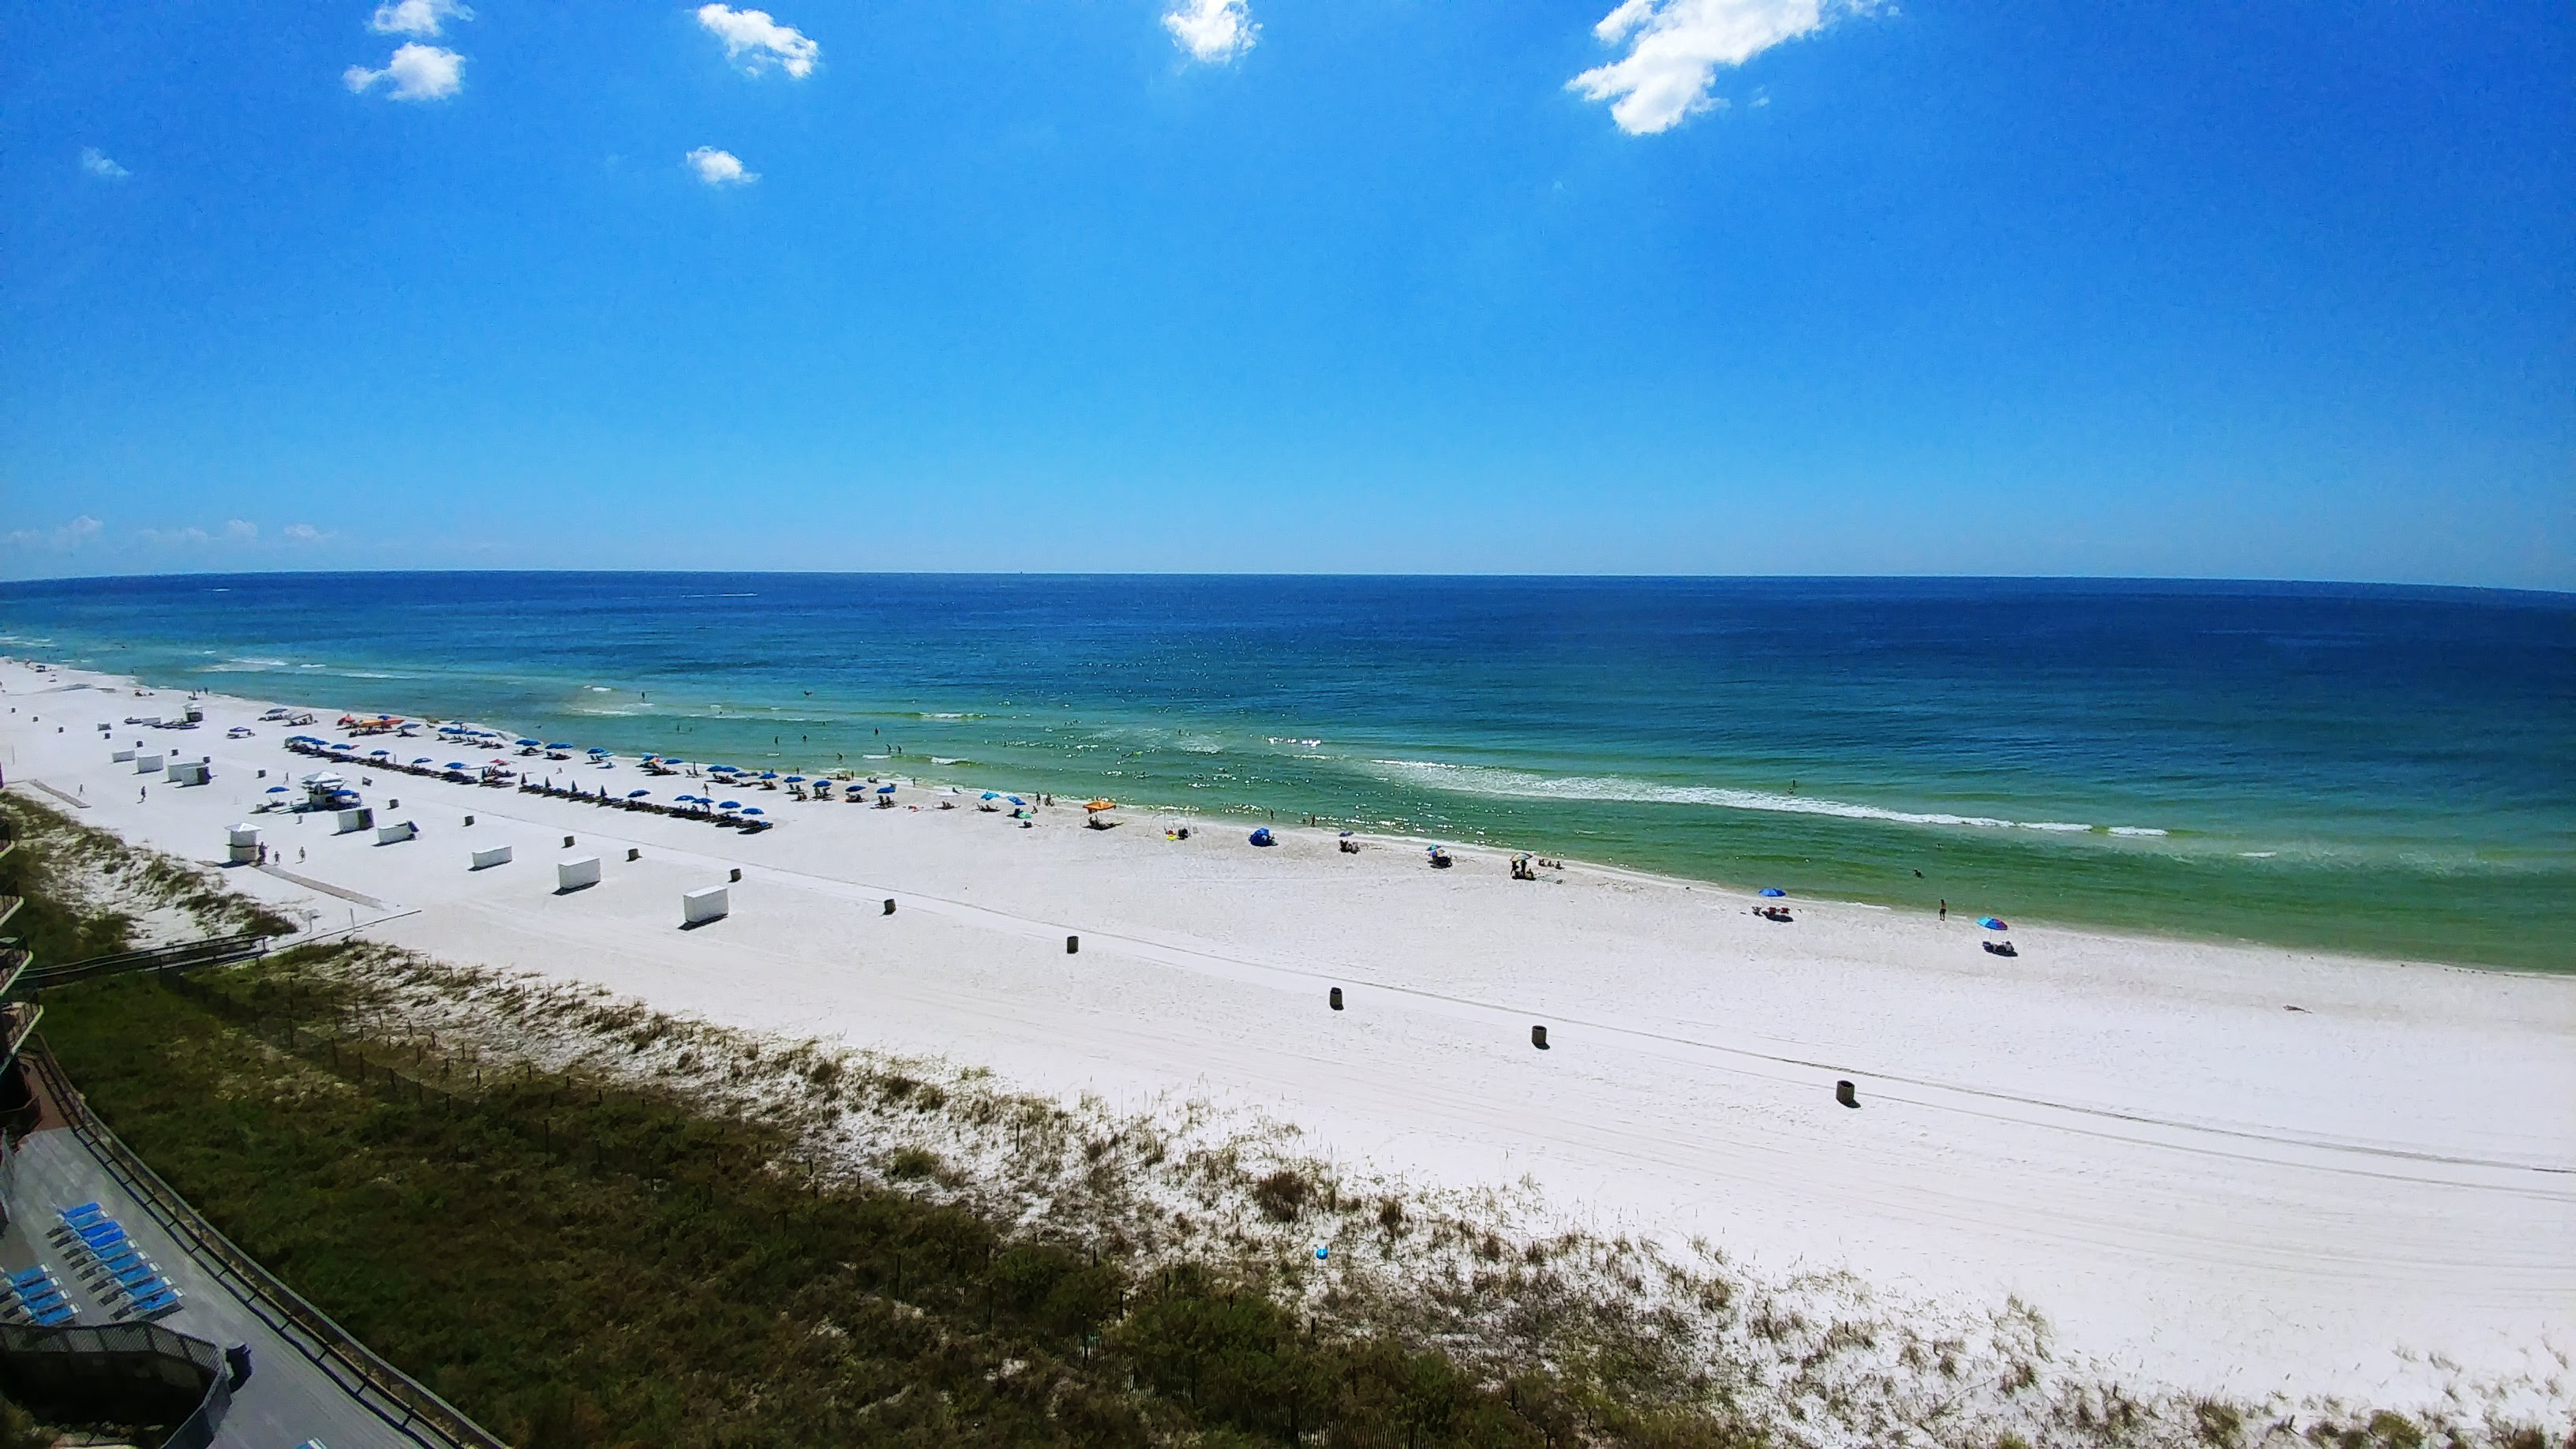 Panama City Beach - a view from our beach rental condos